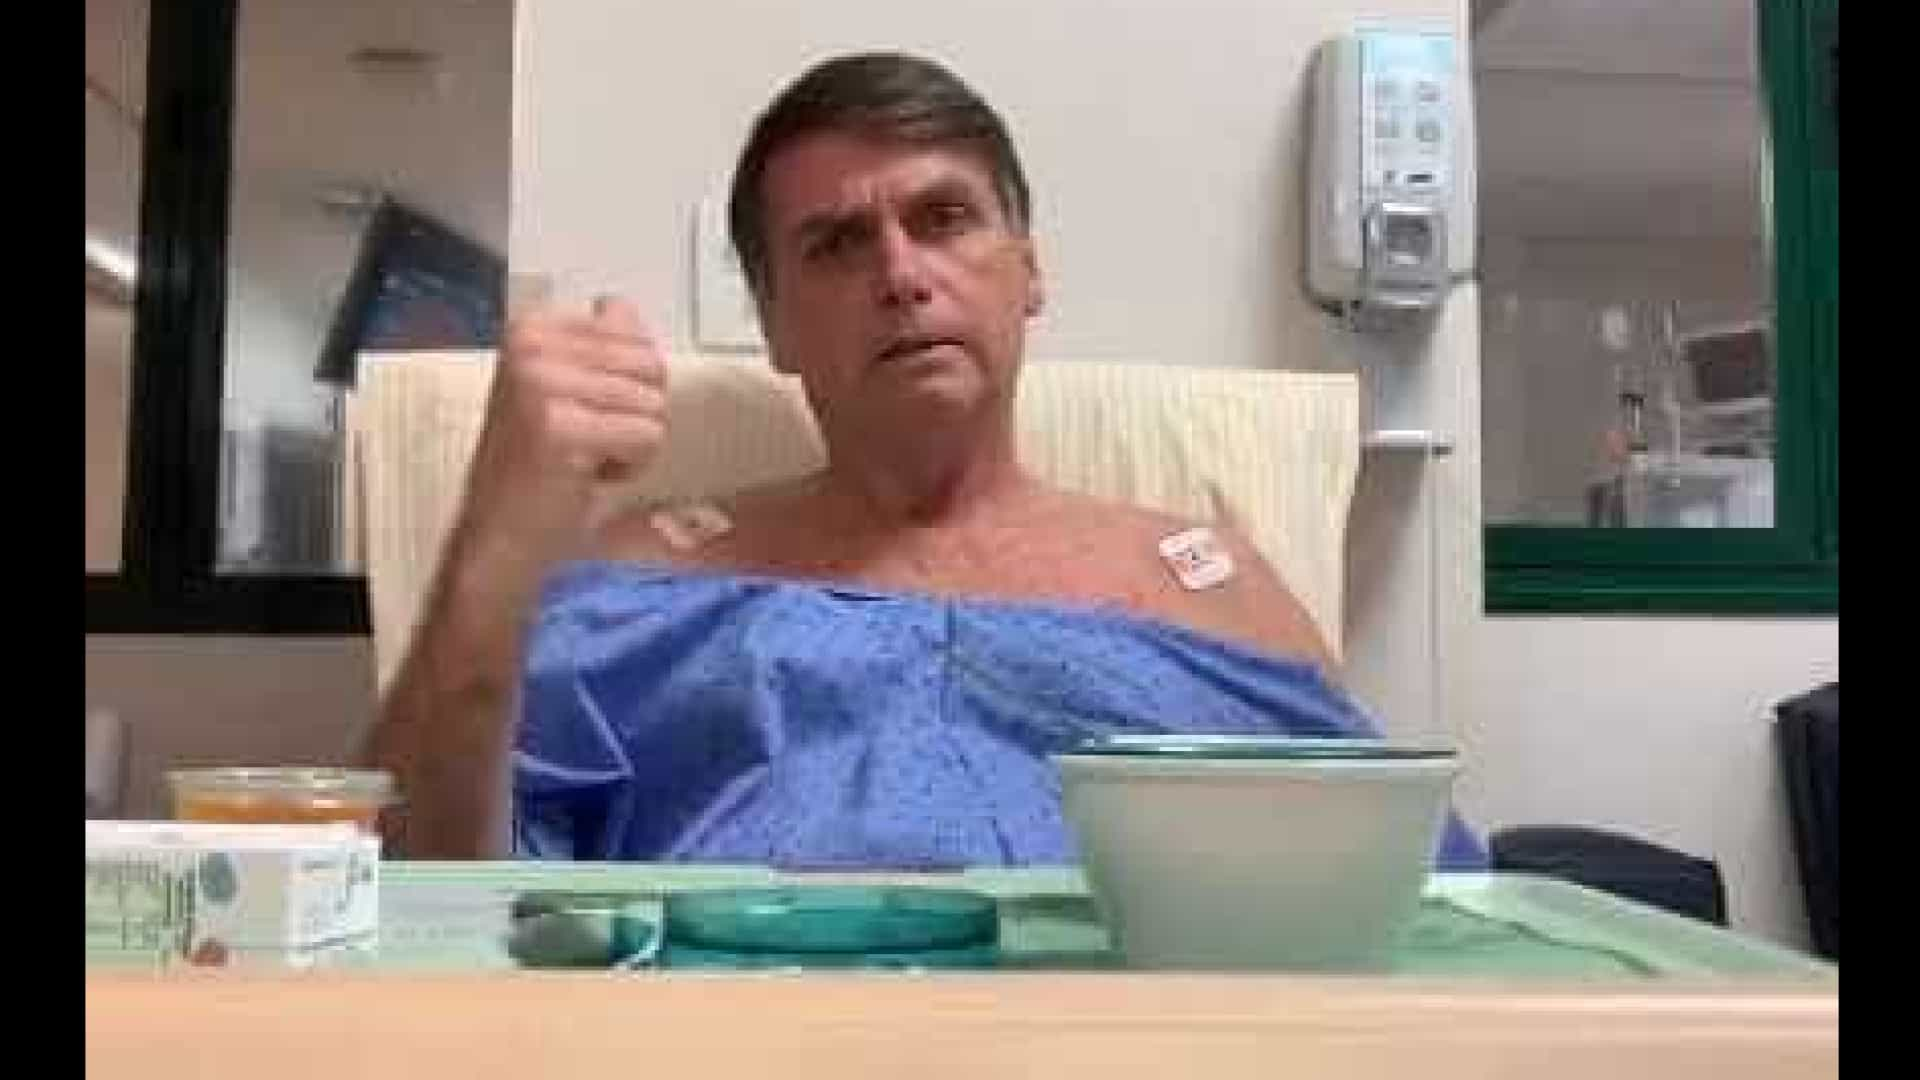 Médicos reduzem dieta endovenosa de Bolsonaro